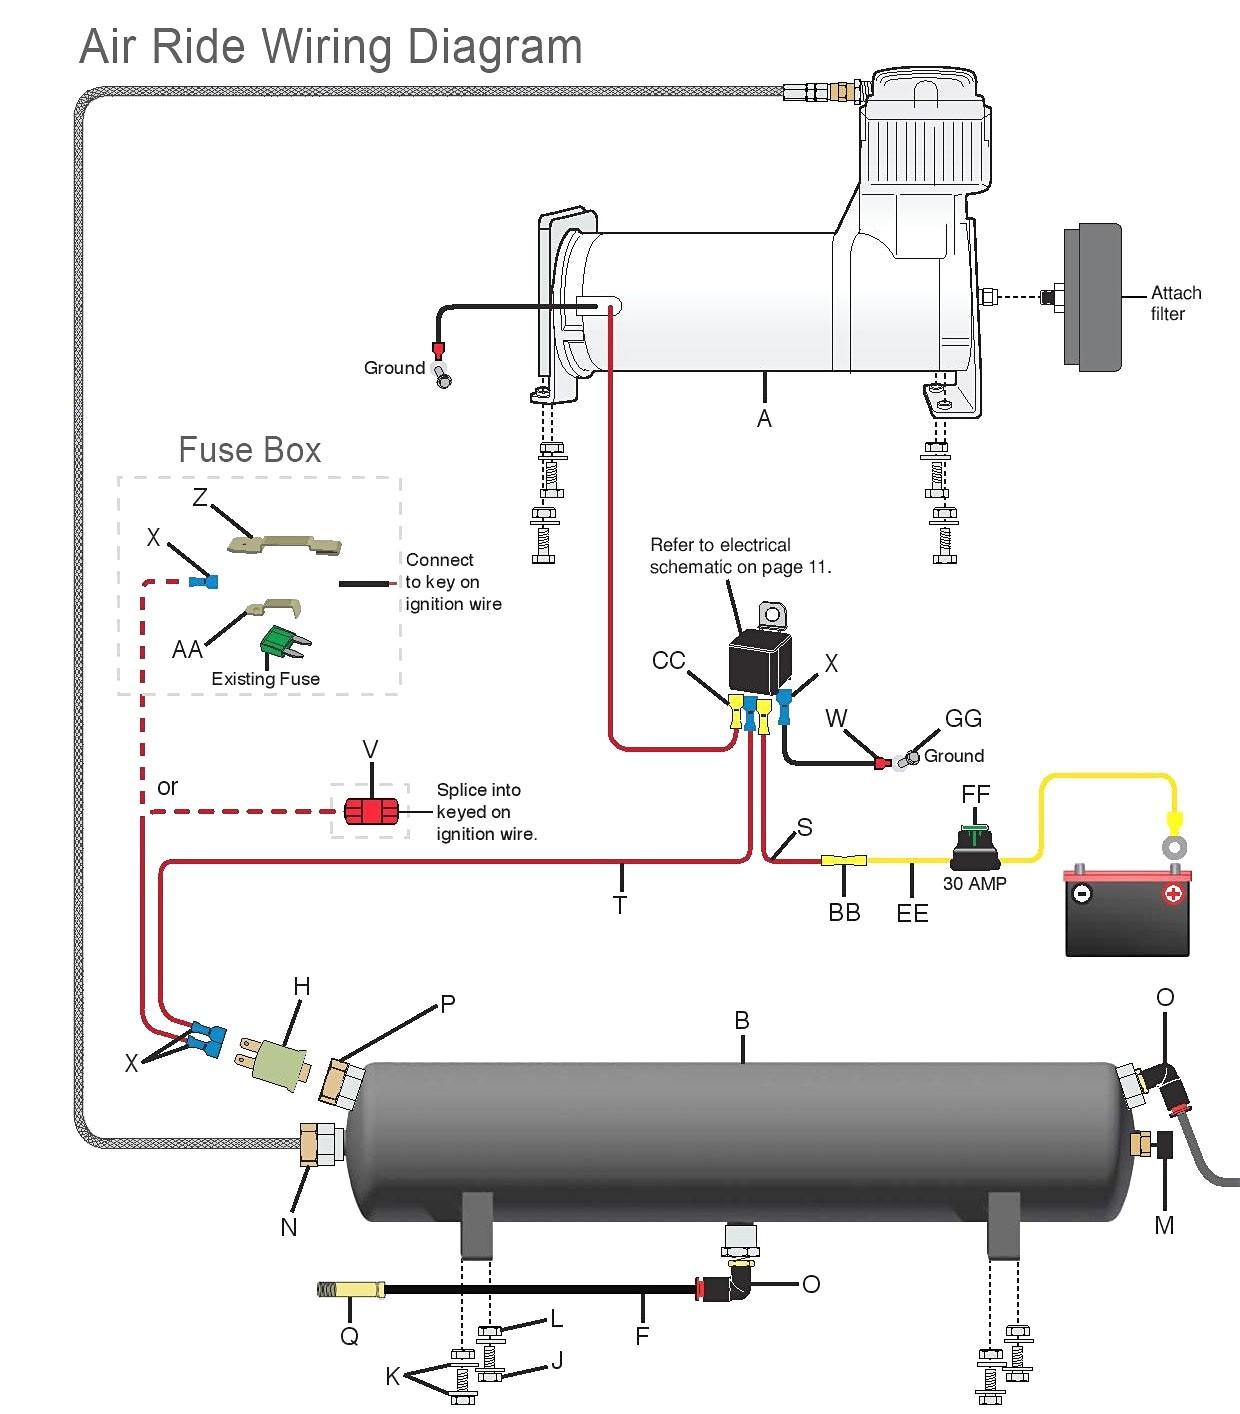 Gmc Air Ride Wiring Diagram Diagrams Schematics Inside Suspension